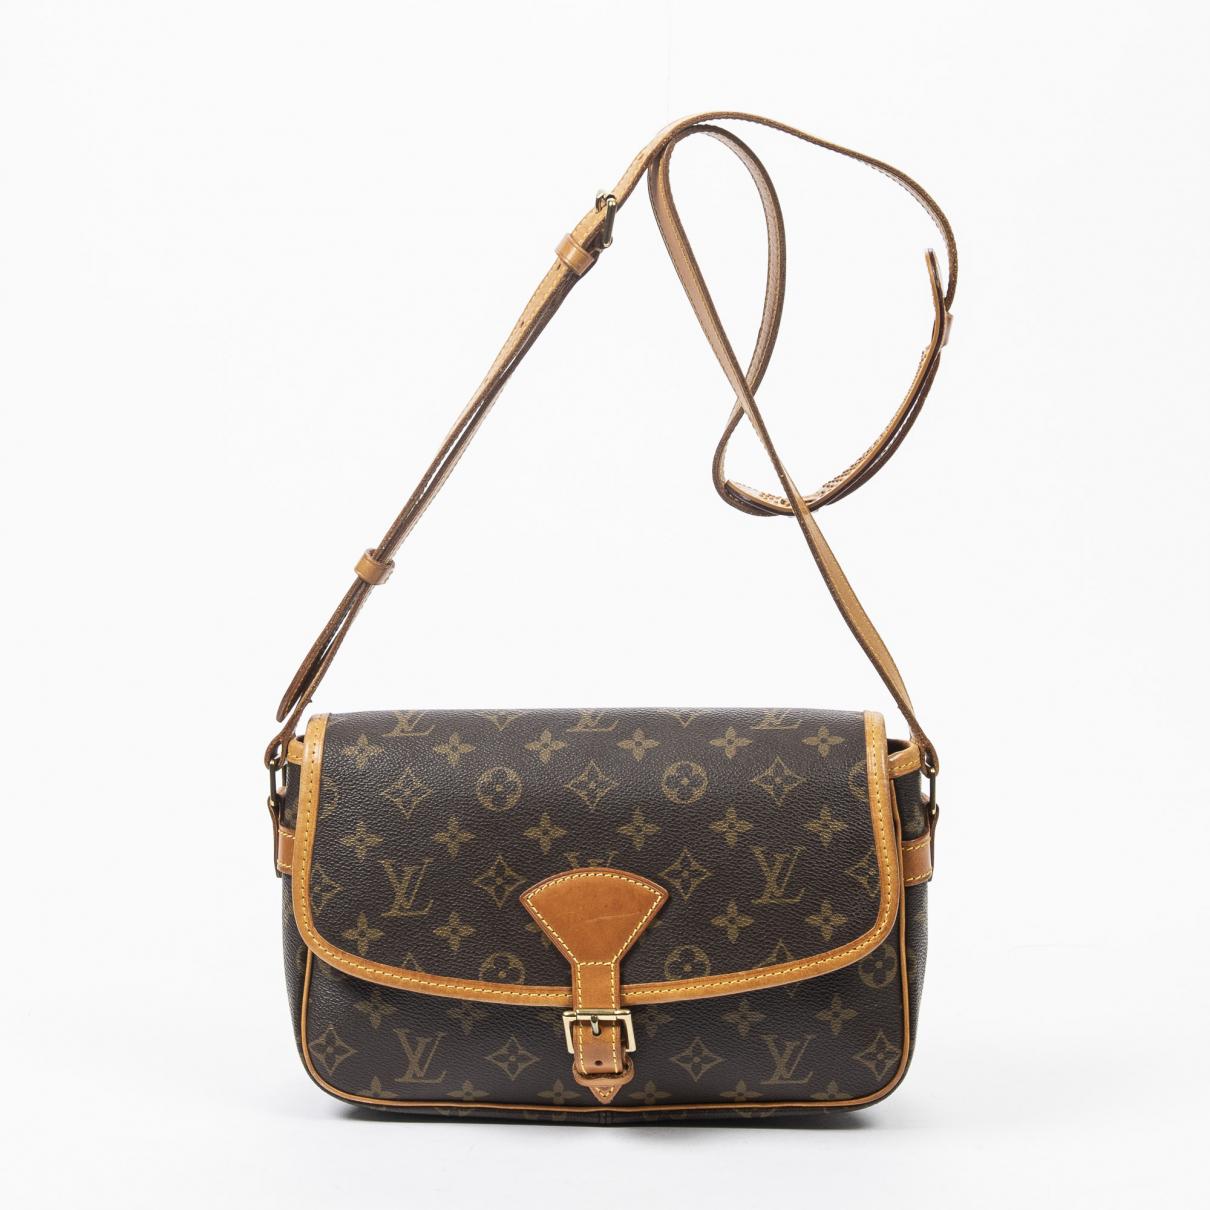 Bolso Sologne Louis Vuitton